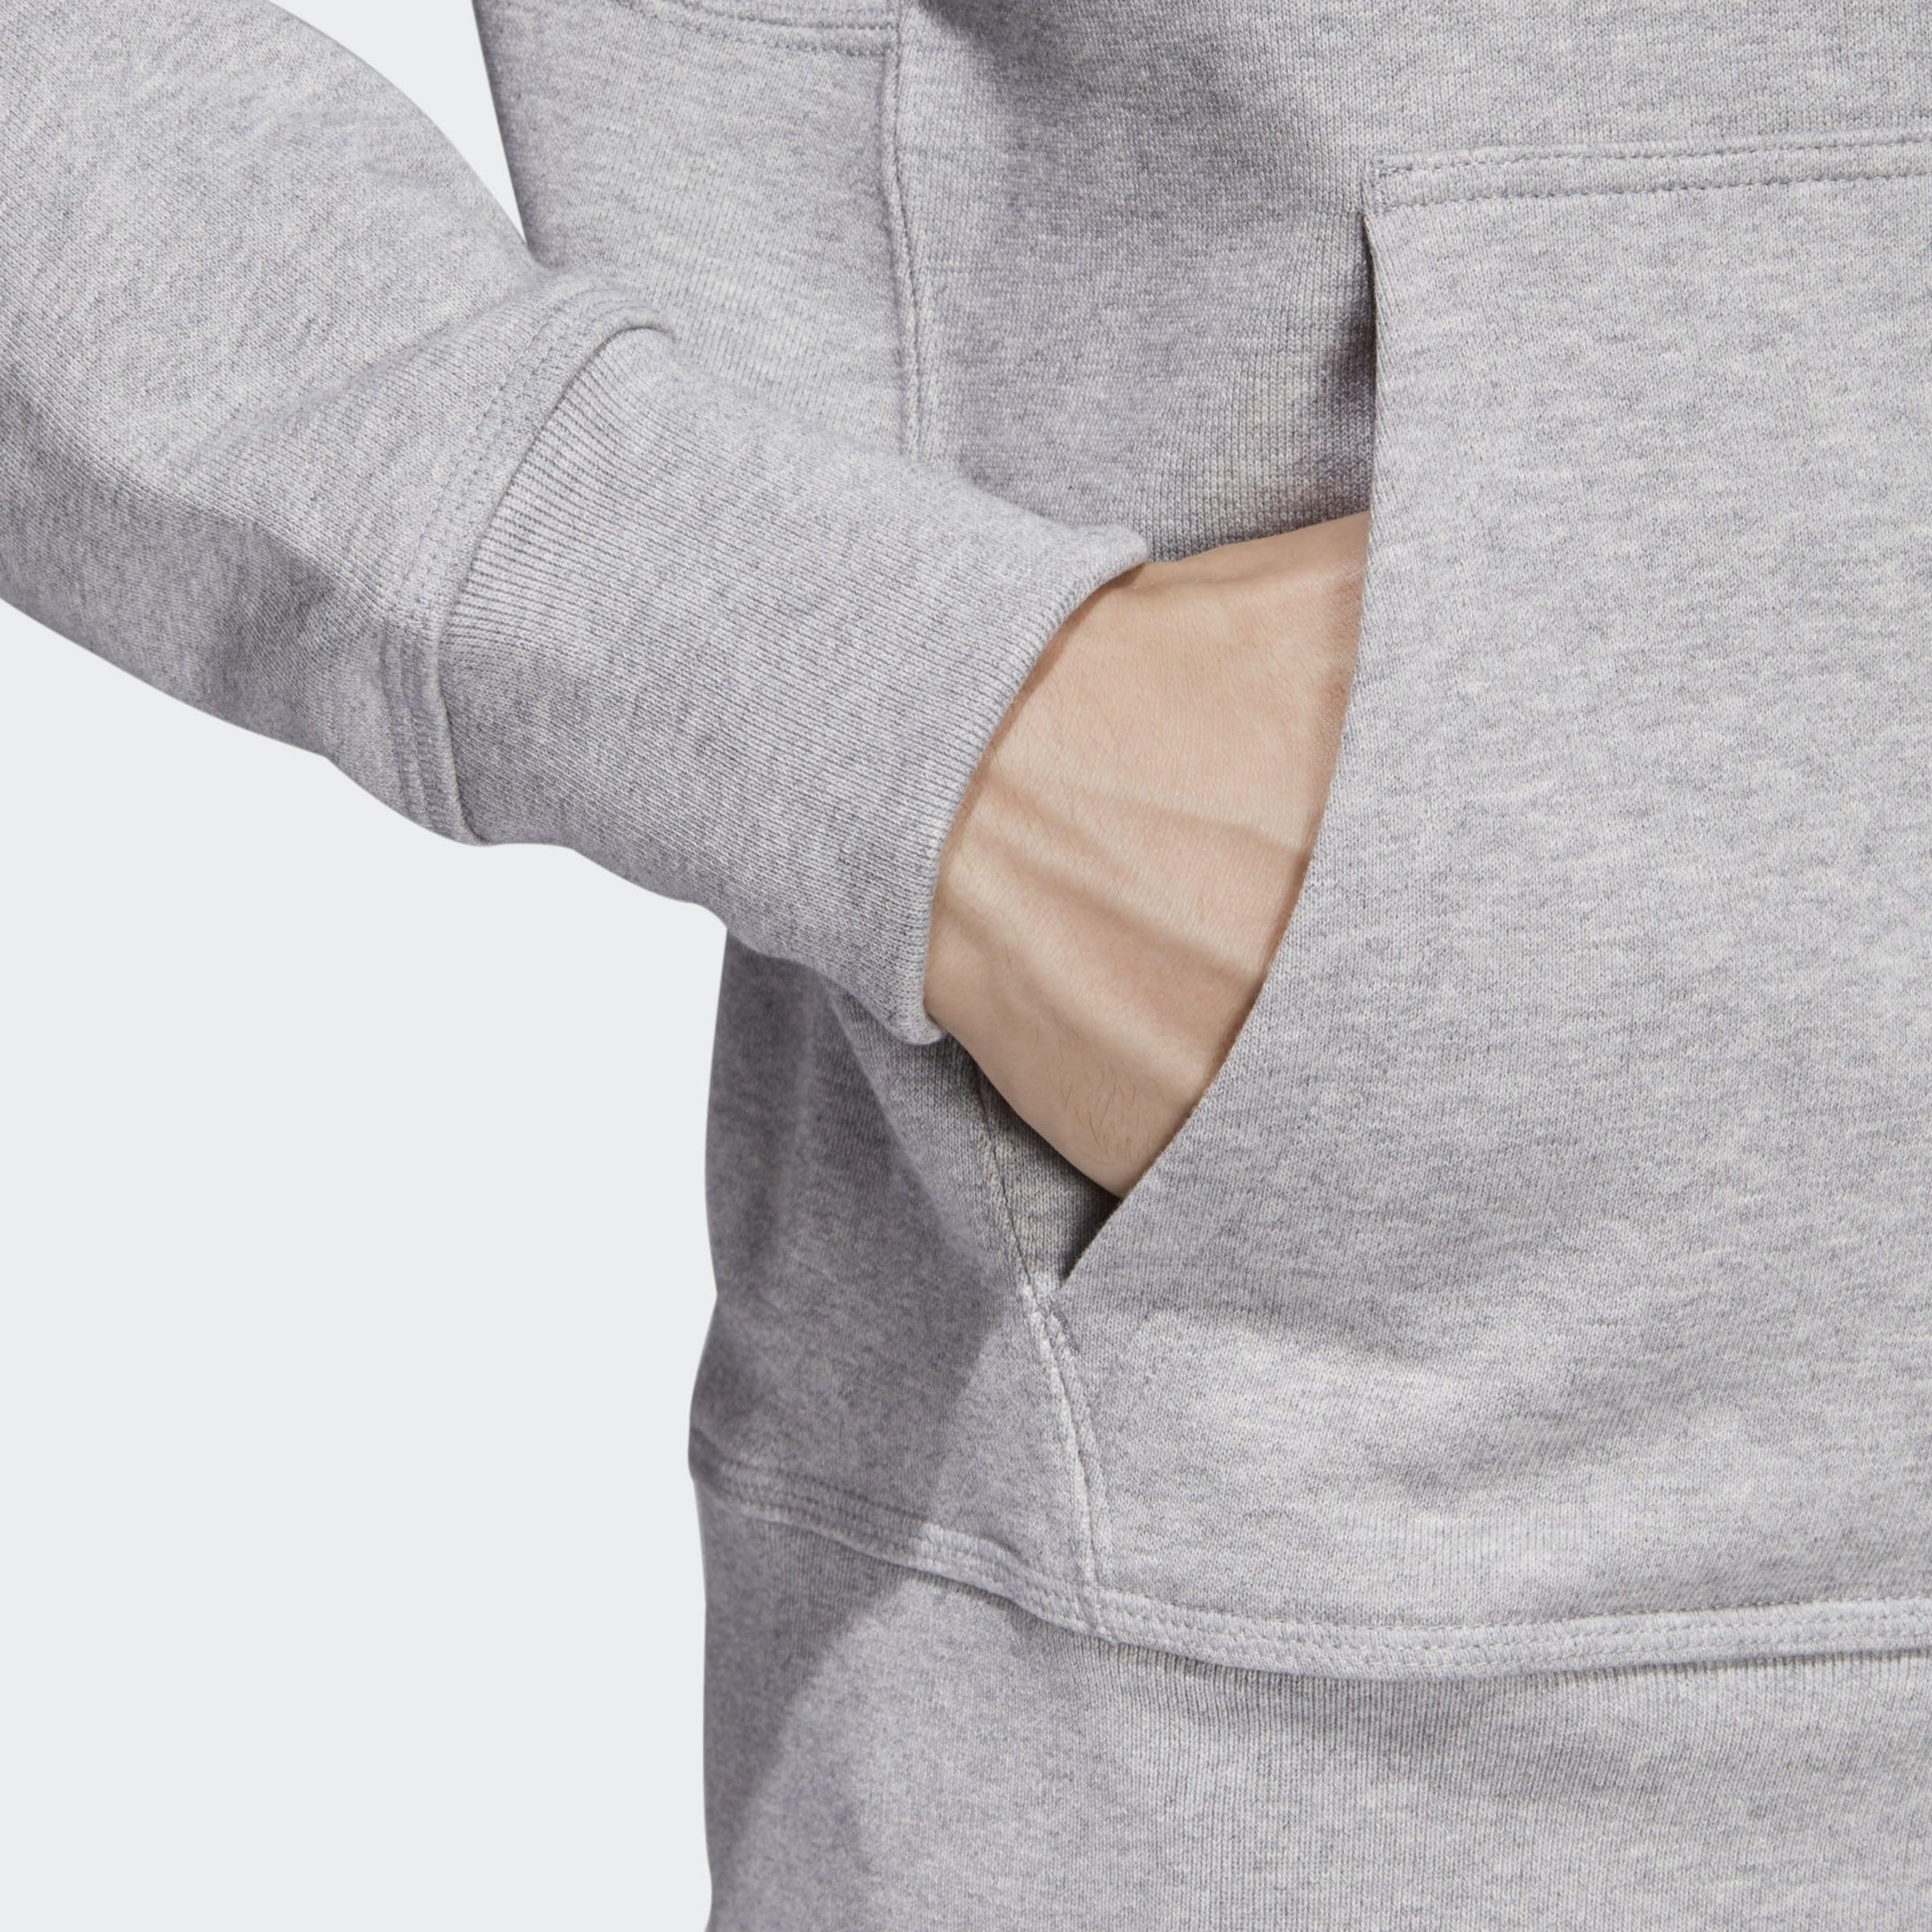 Sweatshirt Adidas Originals Grau In 'kaval' 8PkX0wNOnZ